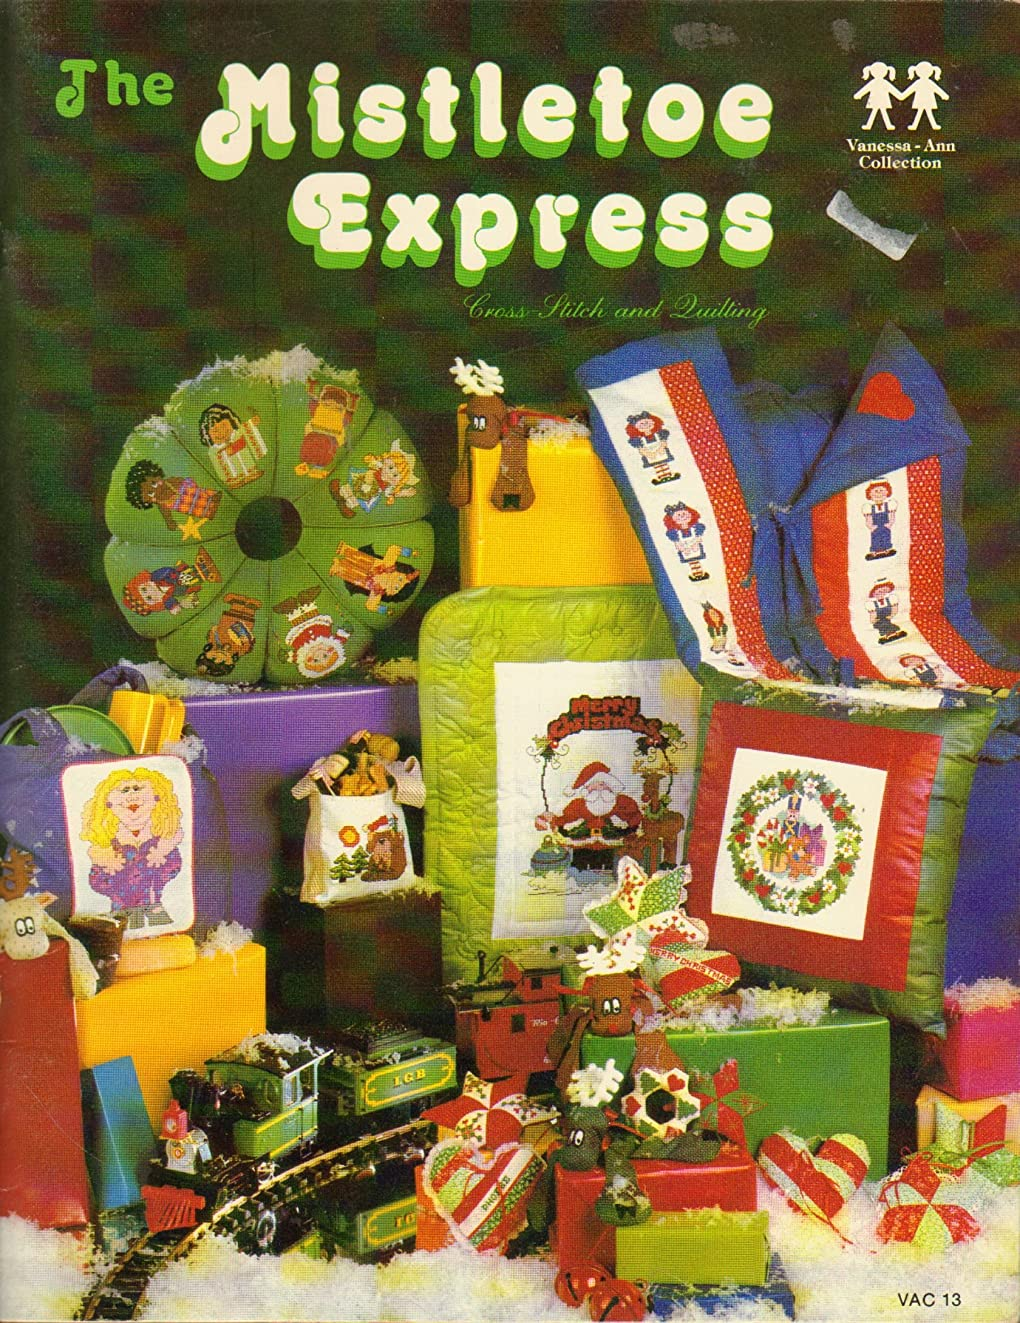 The Mistletoe Express